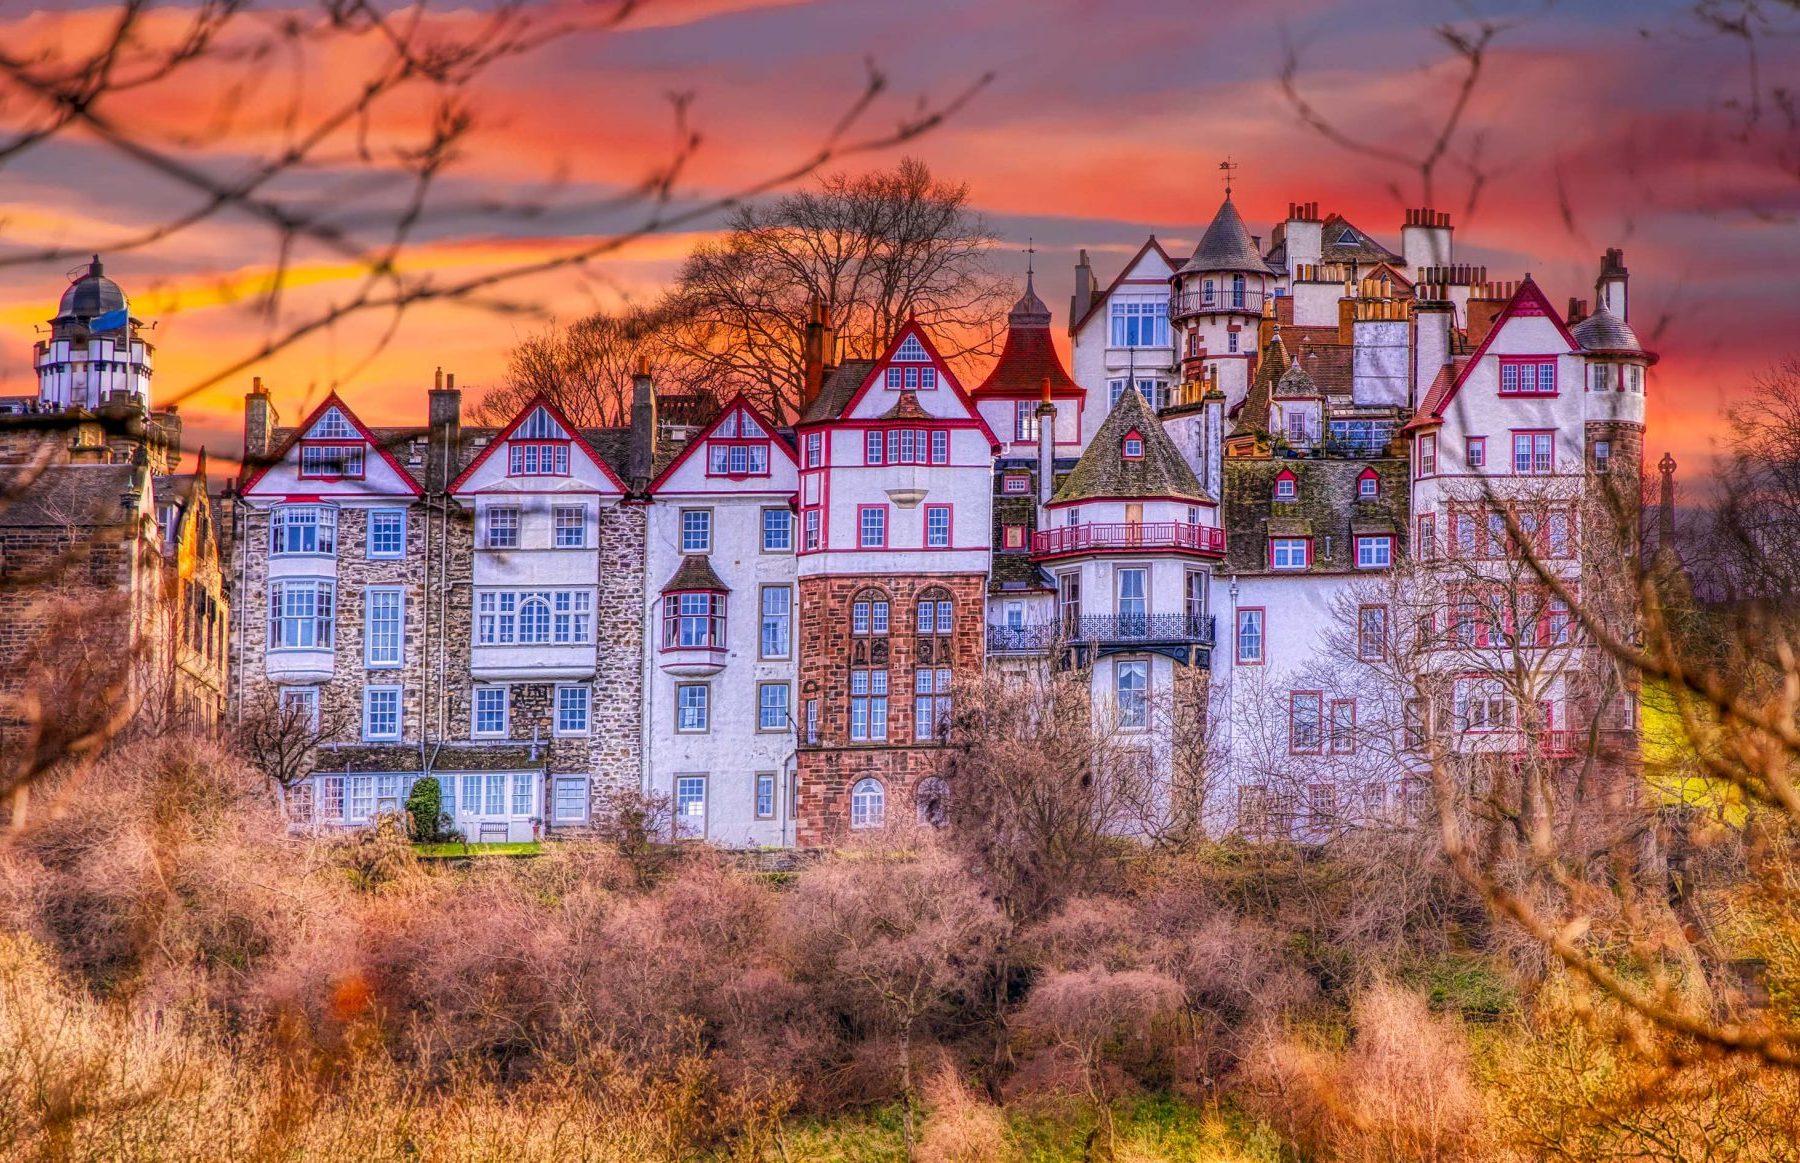 Edinburgh in autumn The Ramsay Garden by Micah Offman